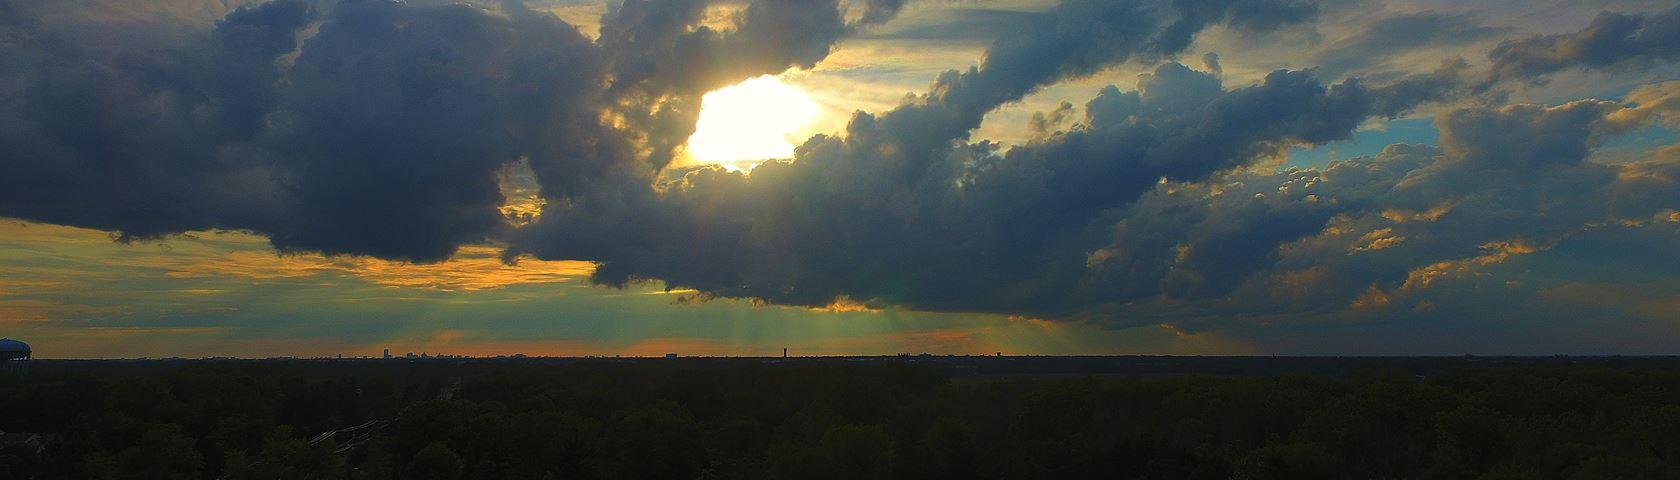 Bowmansvillee Ny Sky